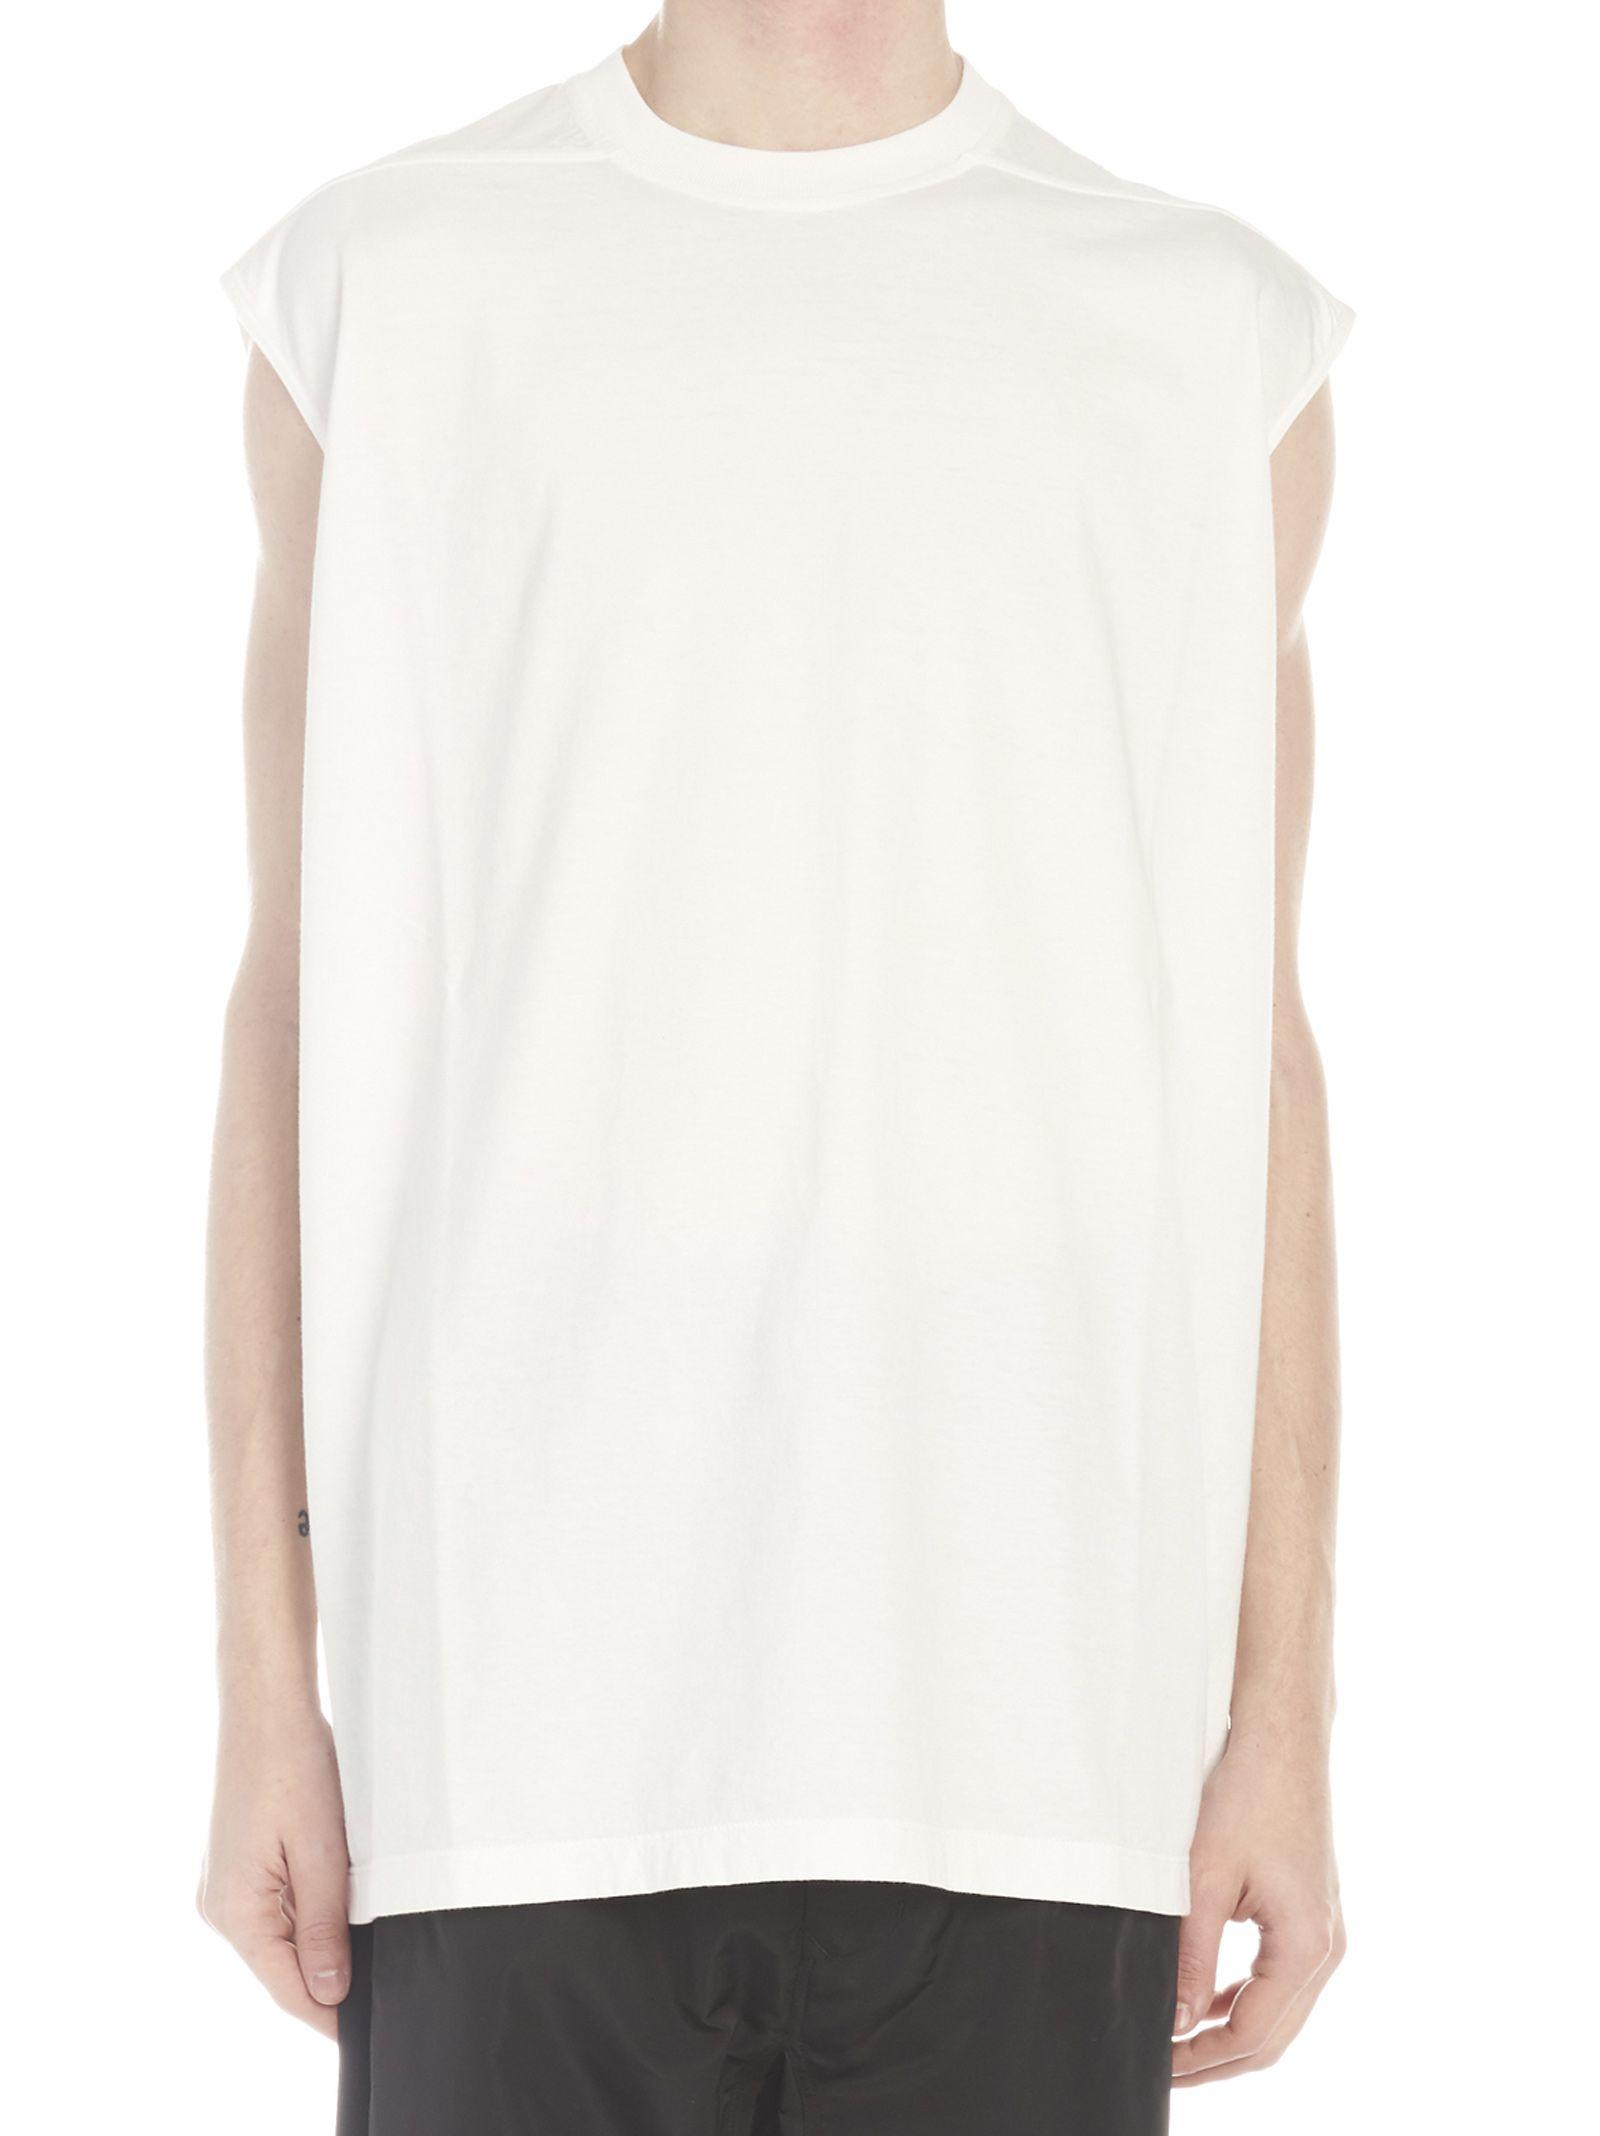 Rick Owens 'tarp Tee' T-shirt